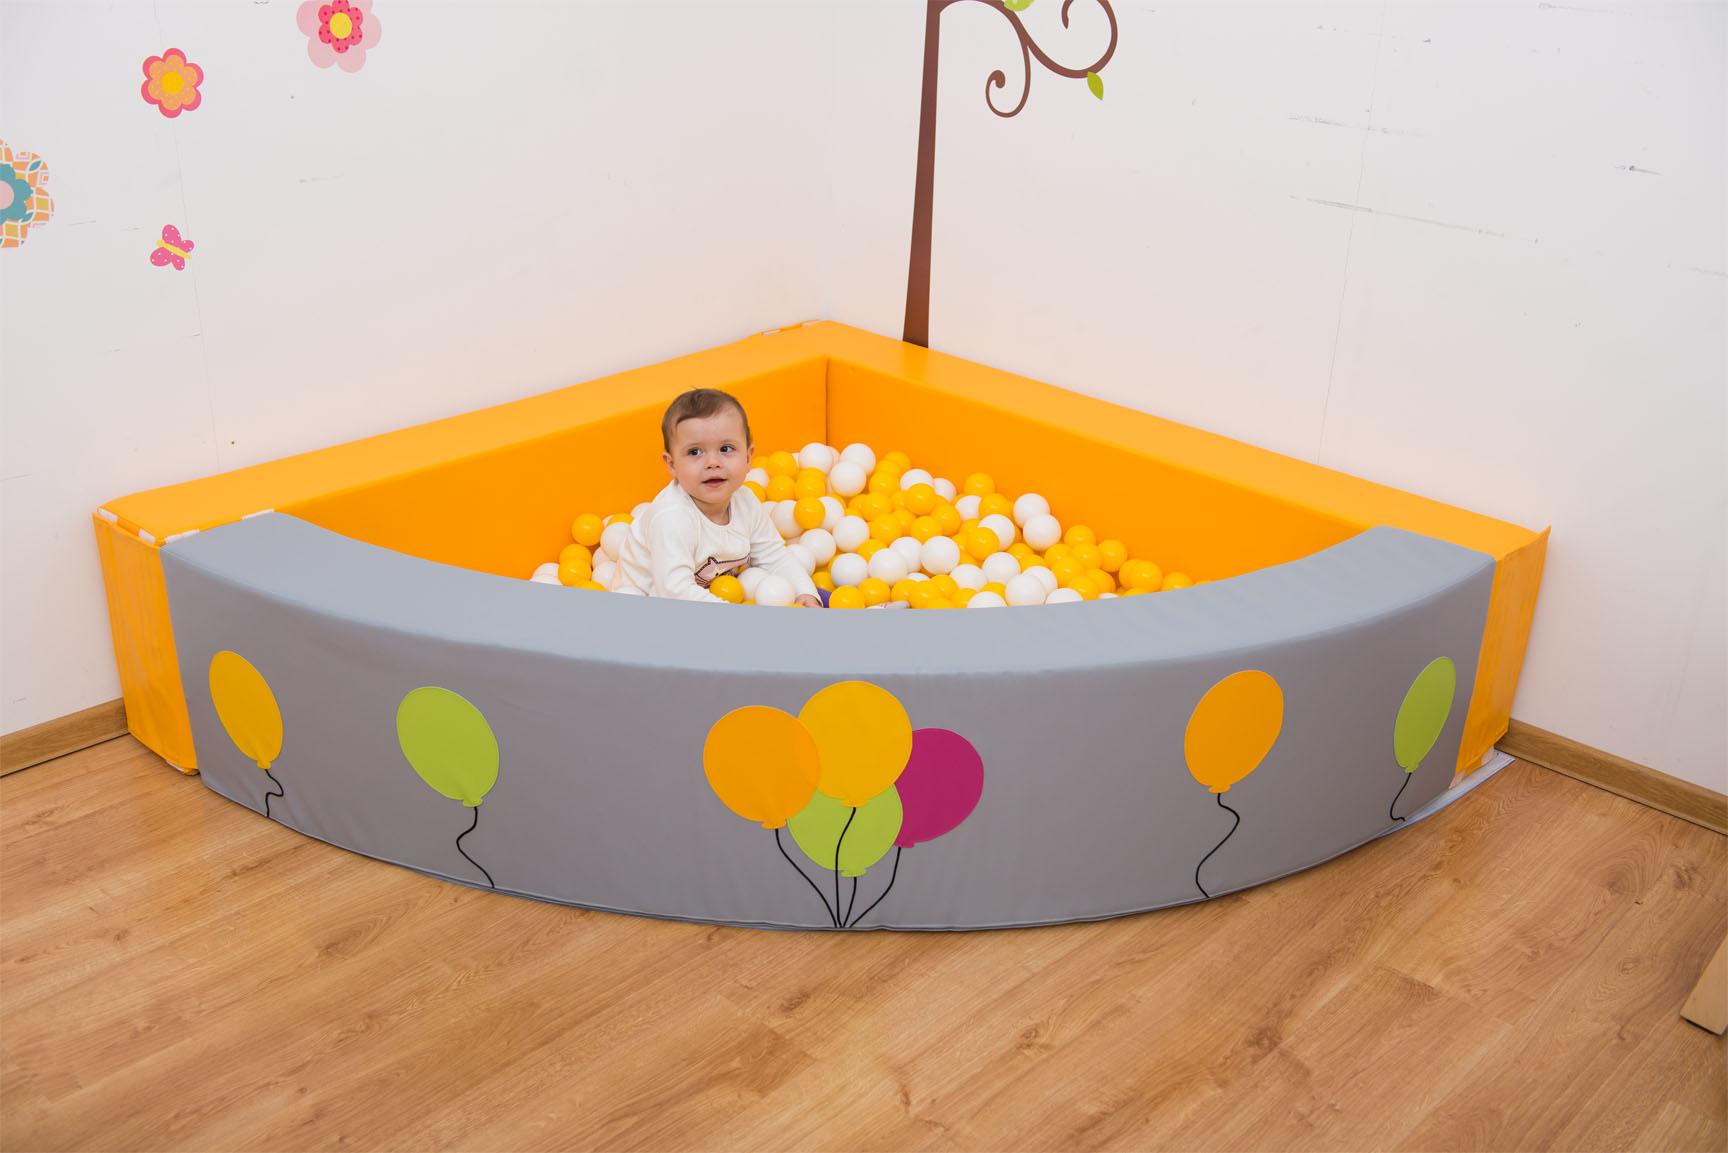 piscine a balles de novum par ludesign ludomania. Black Bedroom Furniture Sets. Home Design Ideas